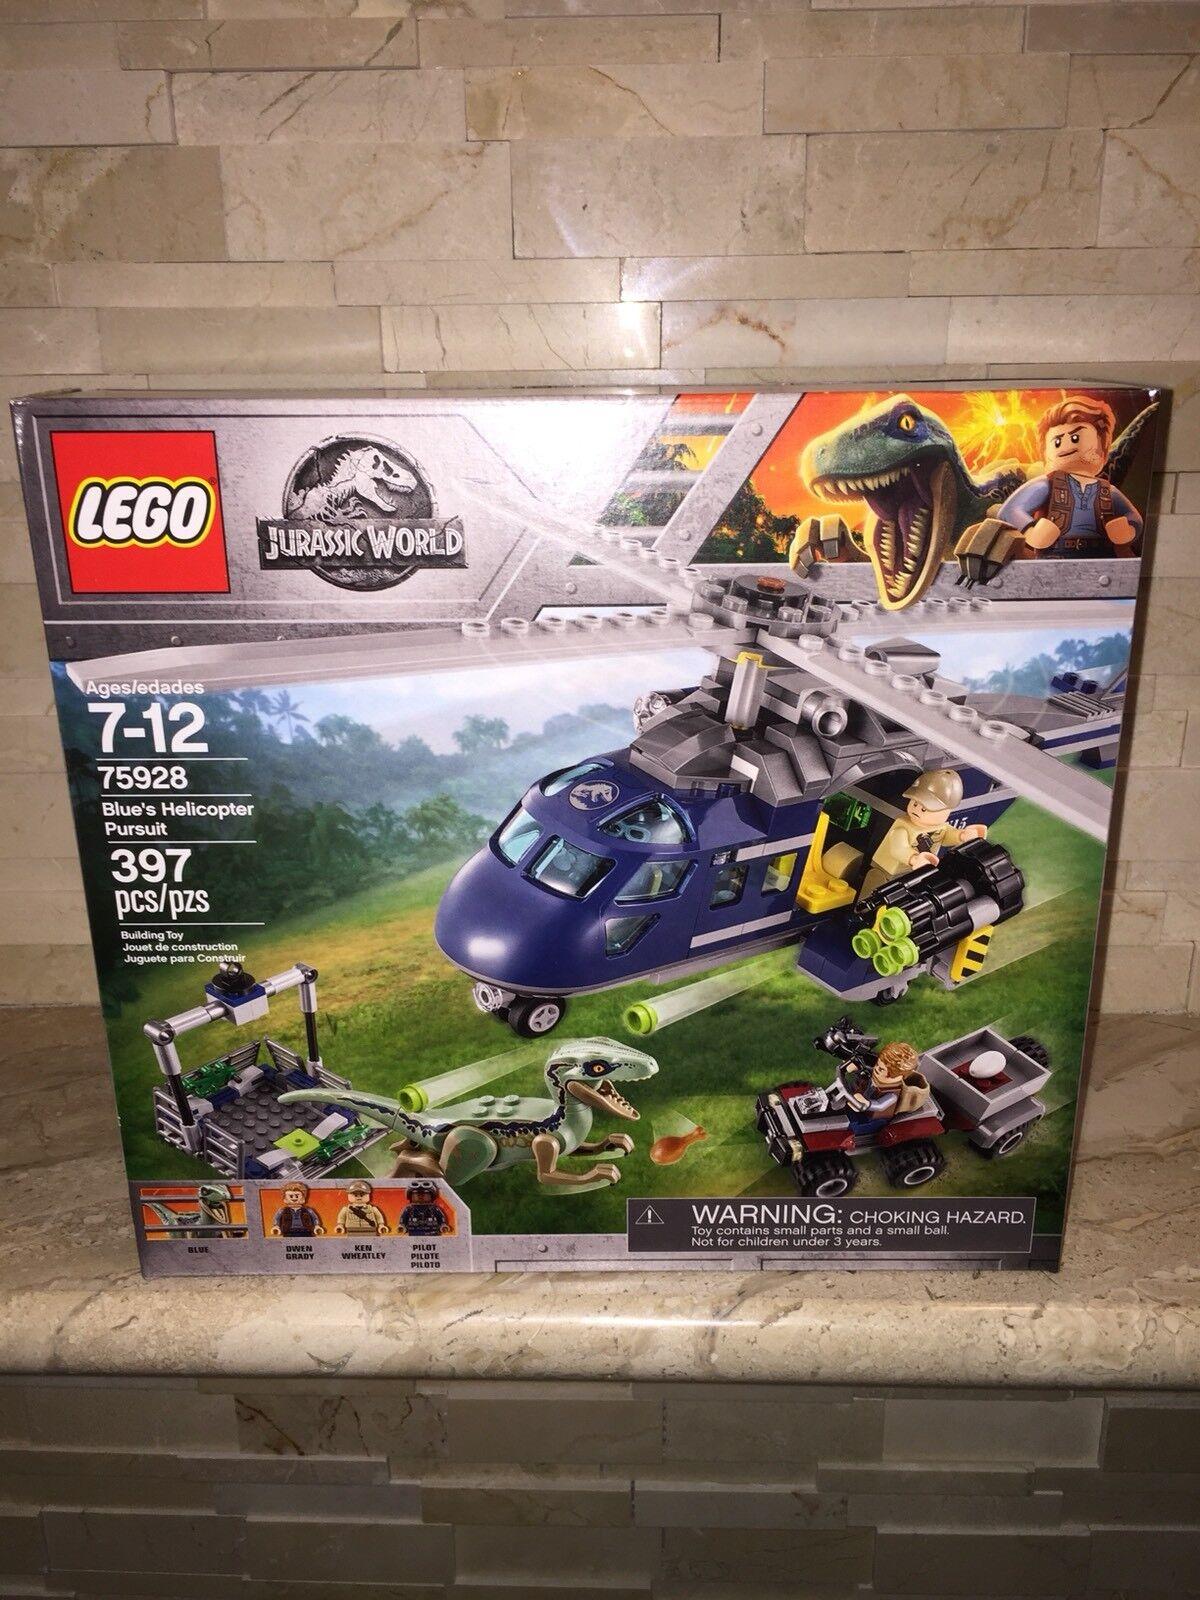 LEGO JURASSIC WORLD SET 75928 bluS HELICOPTER PURSUIT